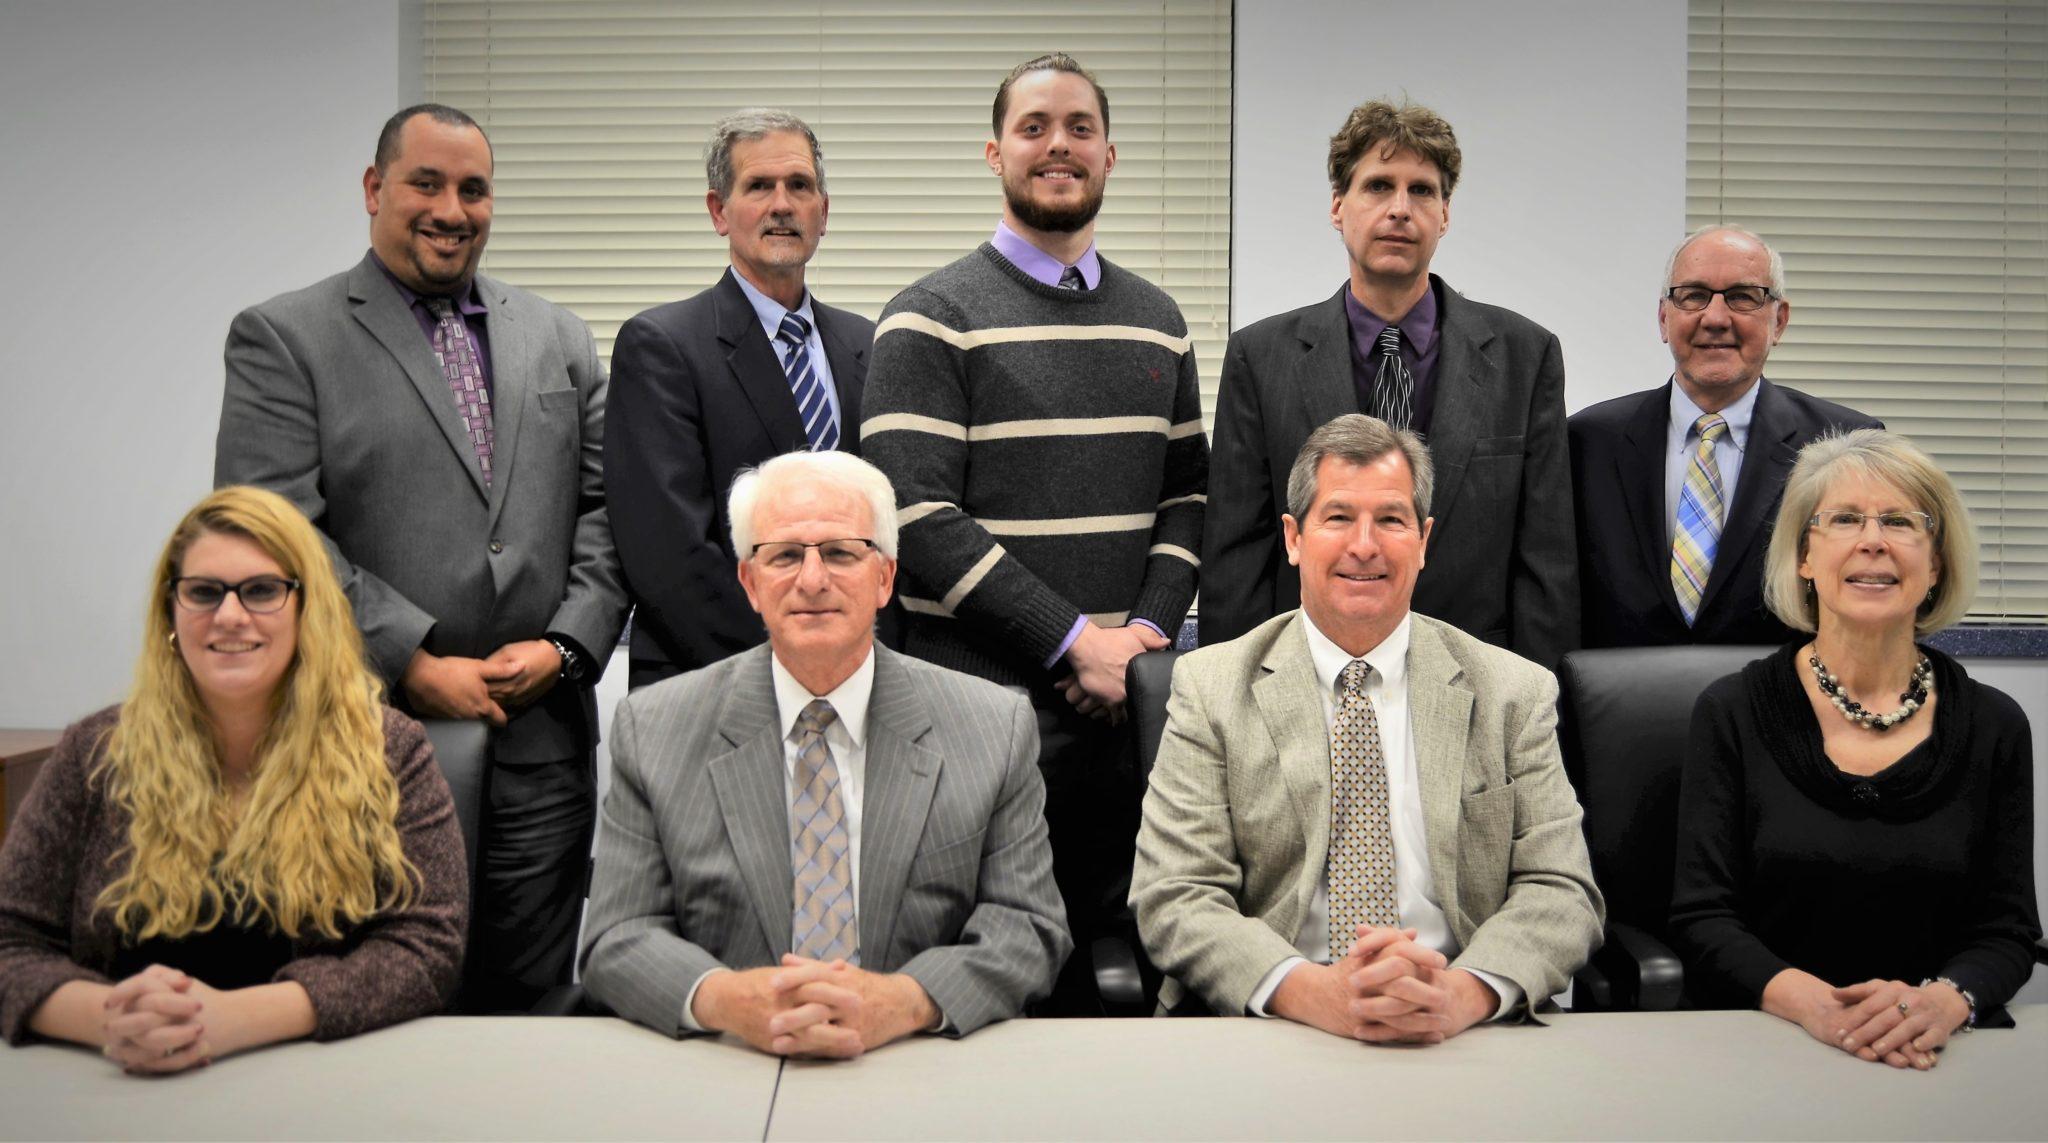 School Board Directors – Penn Manor School District